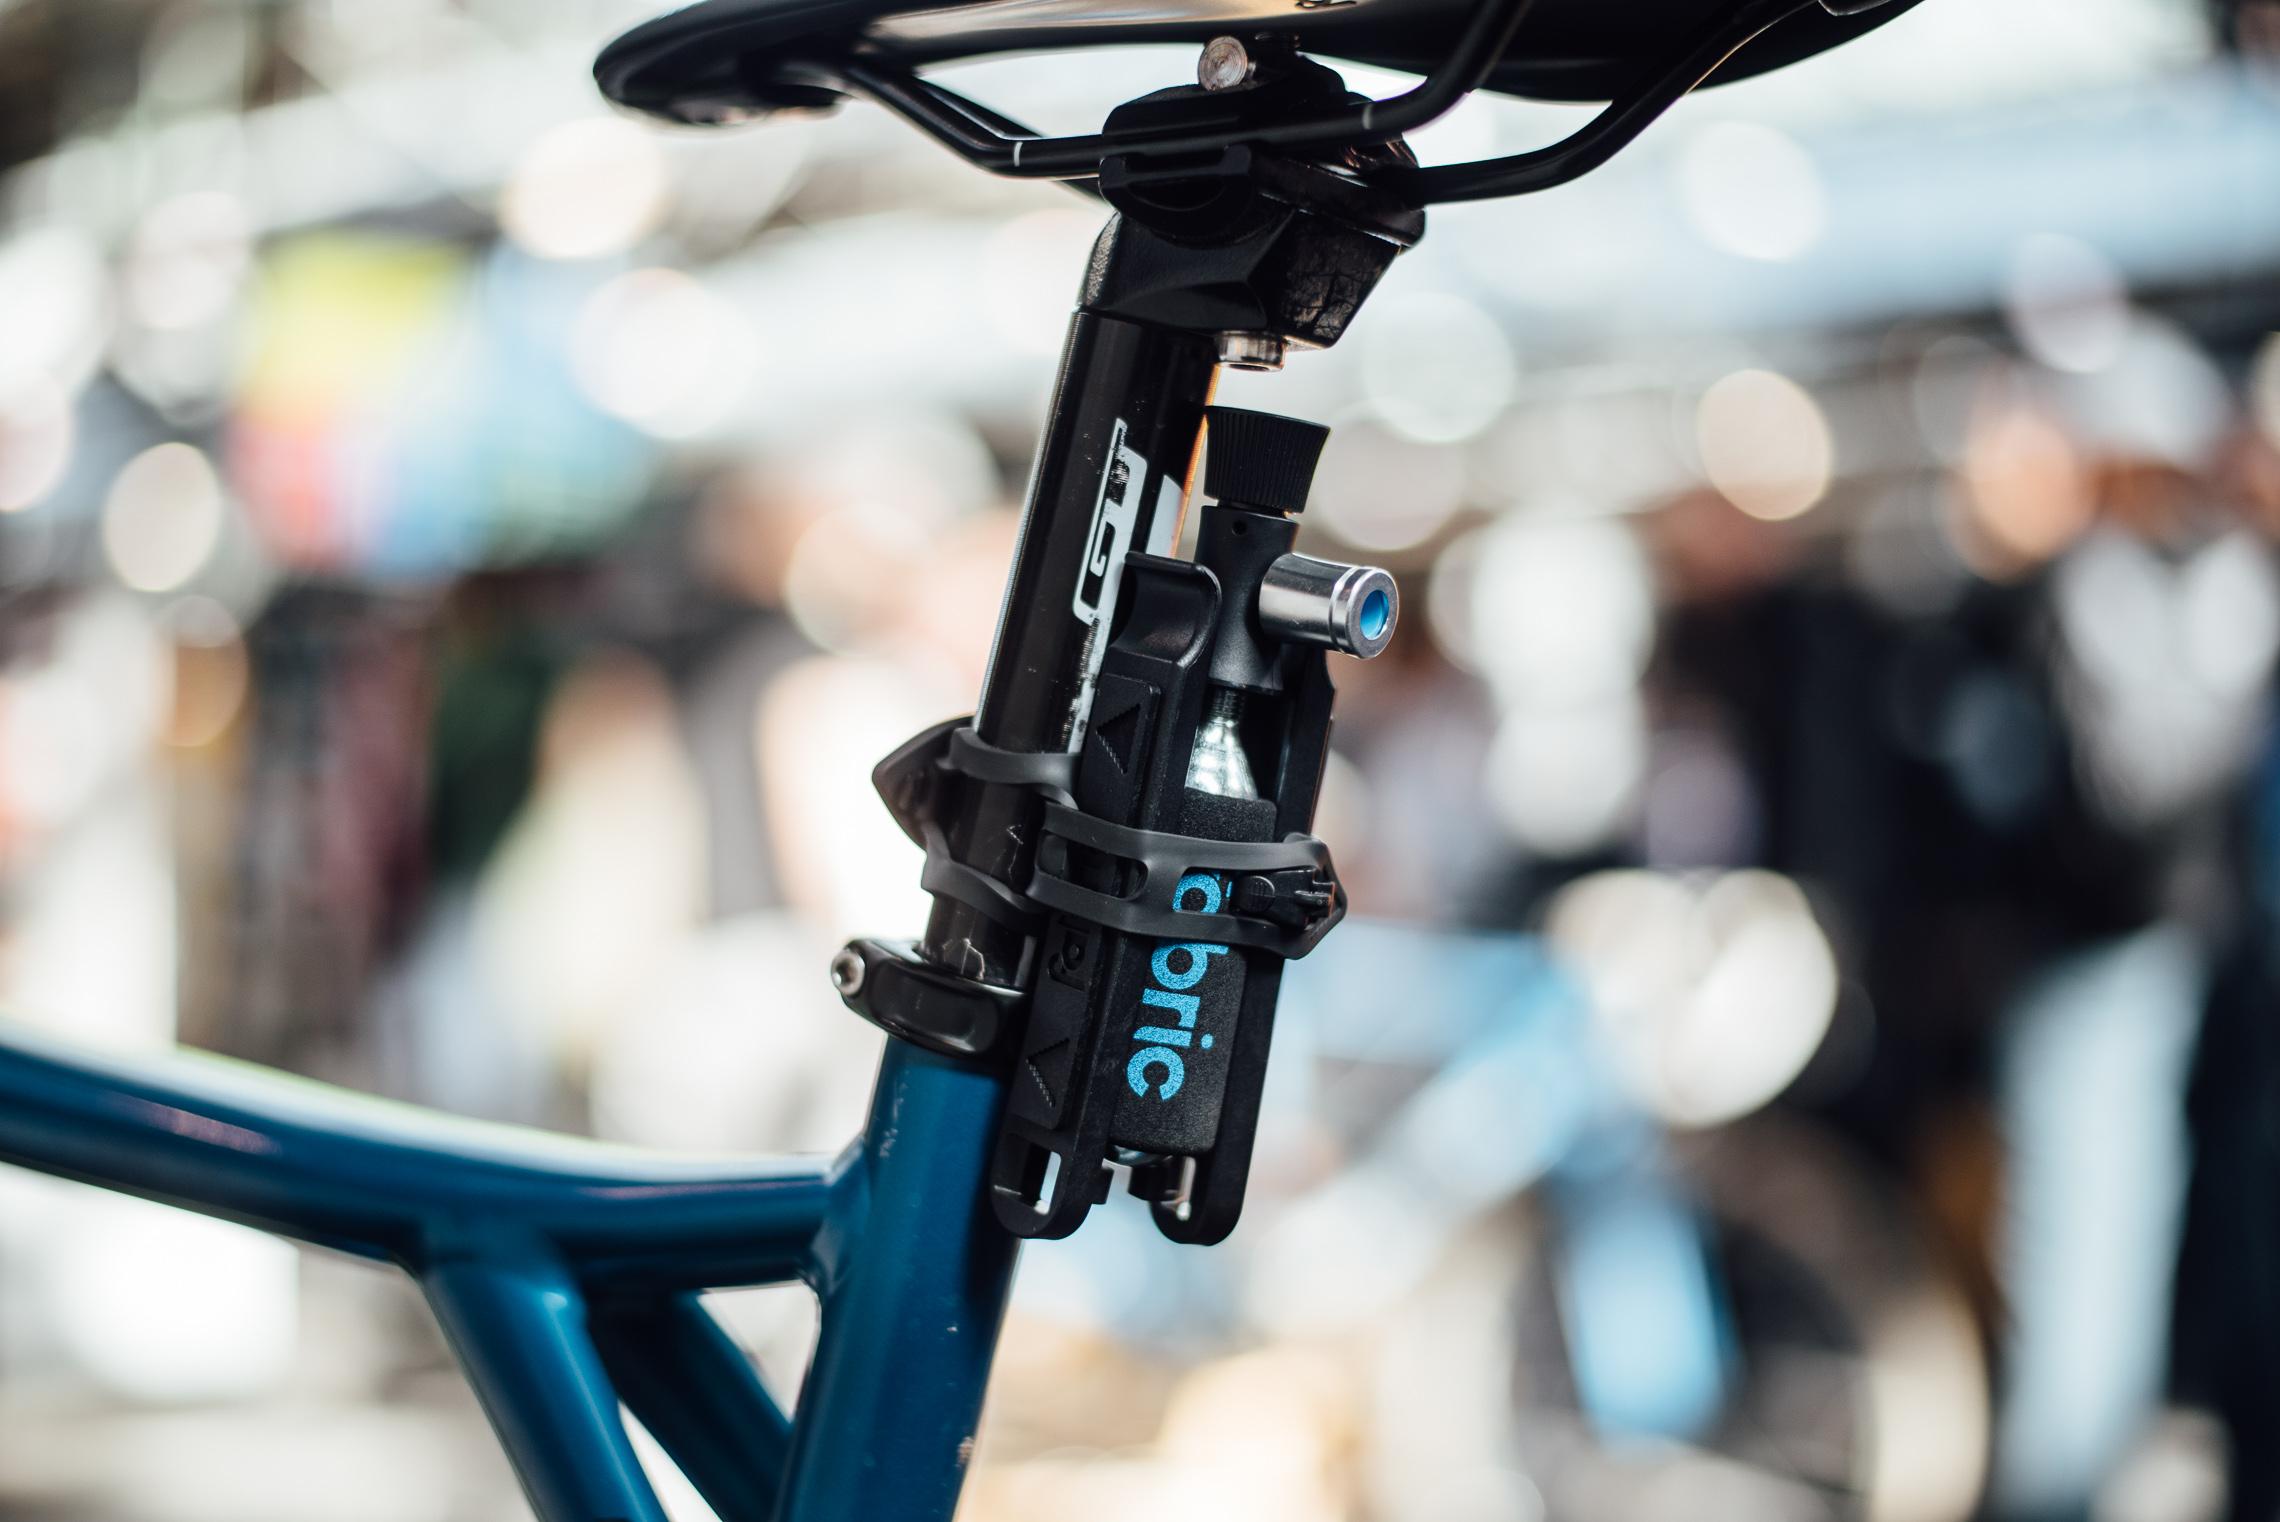 berliner fahrradschau 2016 kleinteile komponenten gadgets mtb. Black Bedroom Furniture Sets. Home Design Ideas